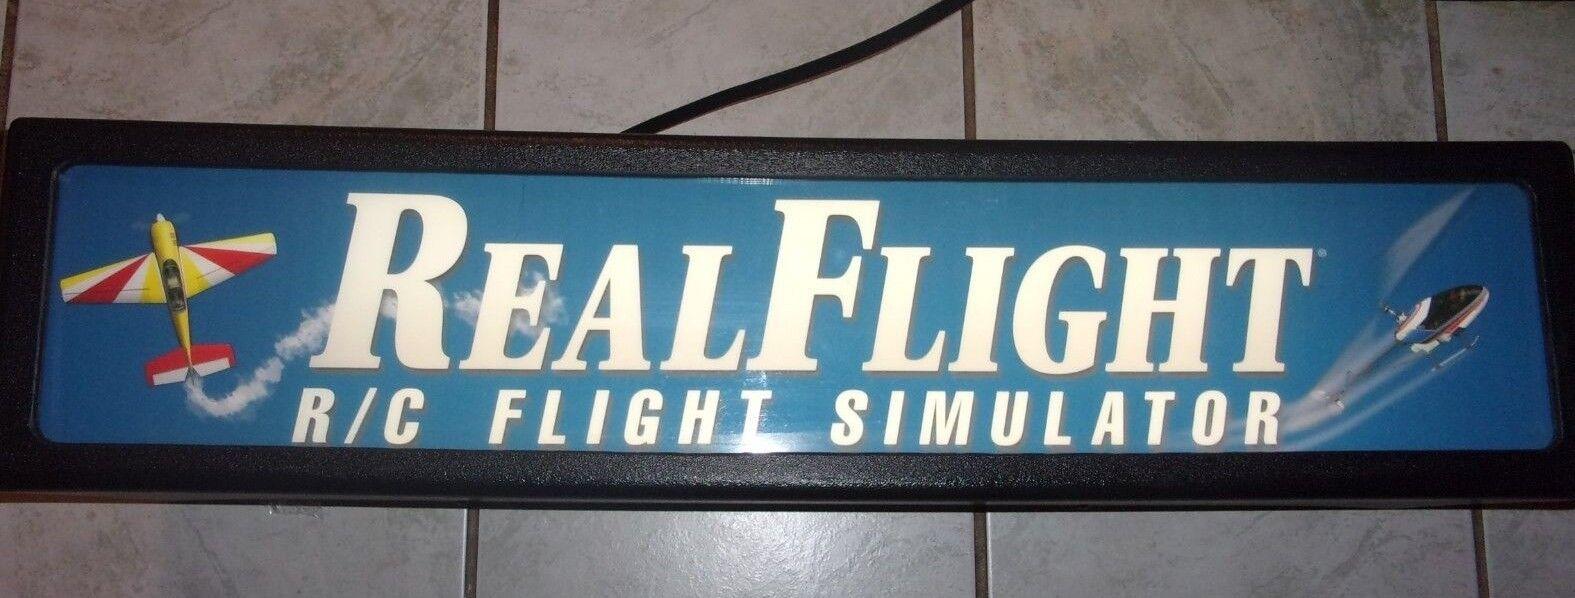 Real Flight RC Simulator SIGN 29 X6